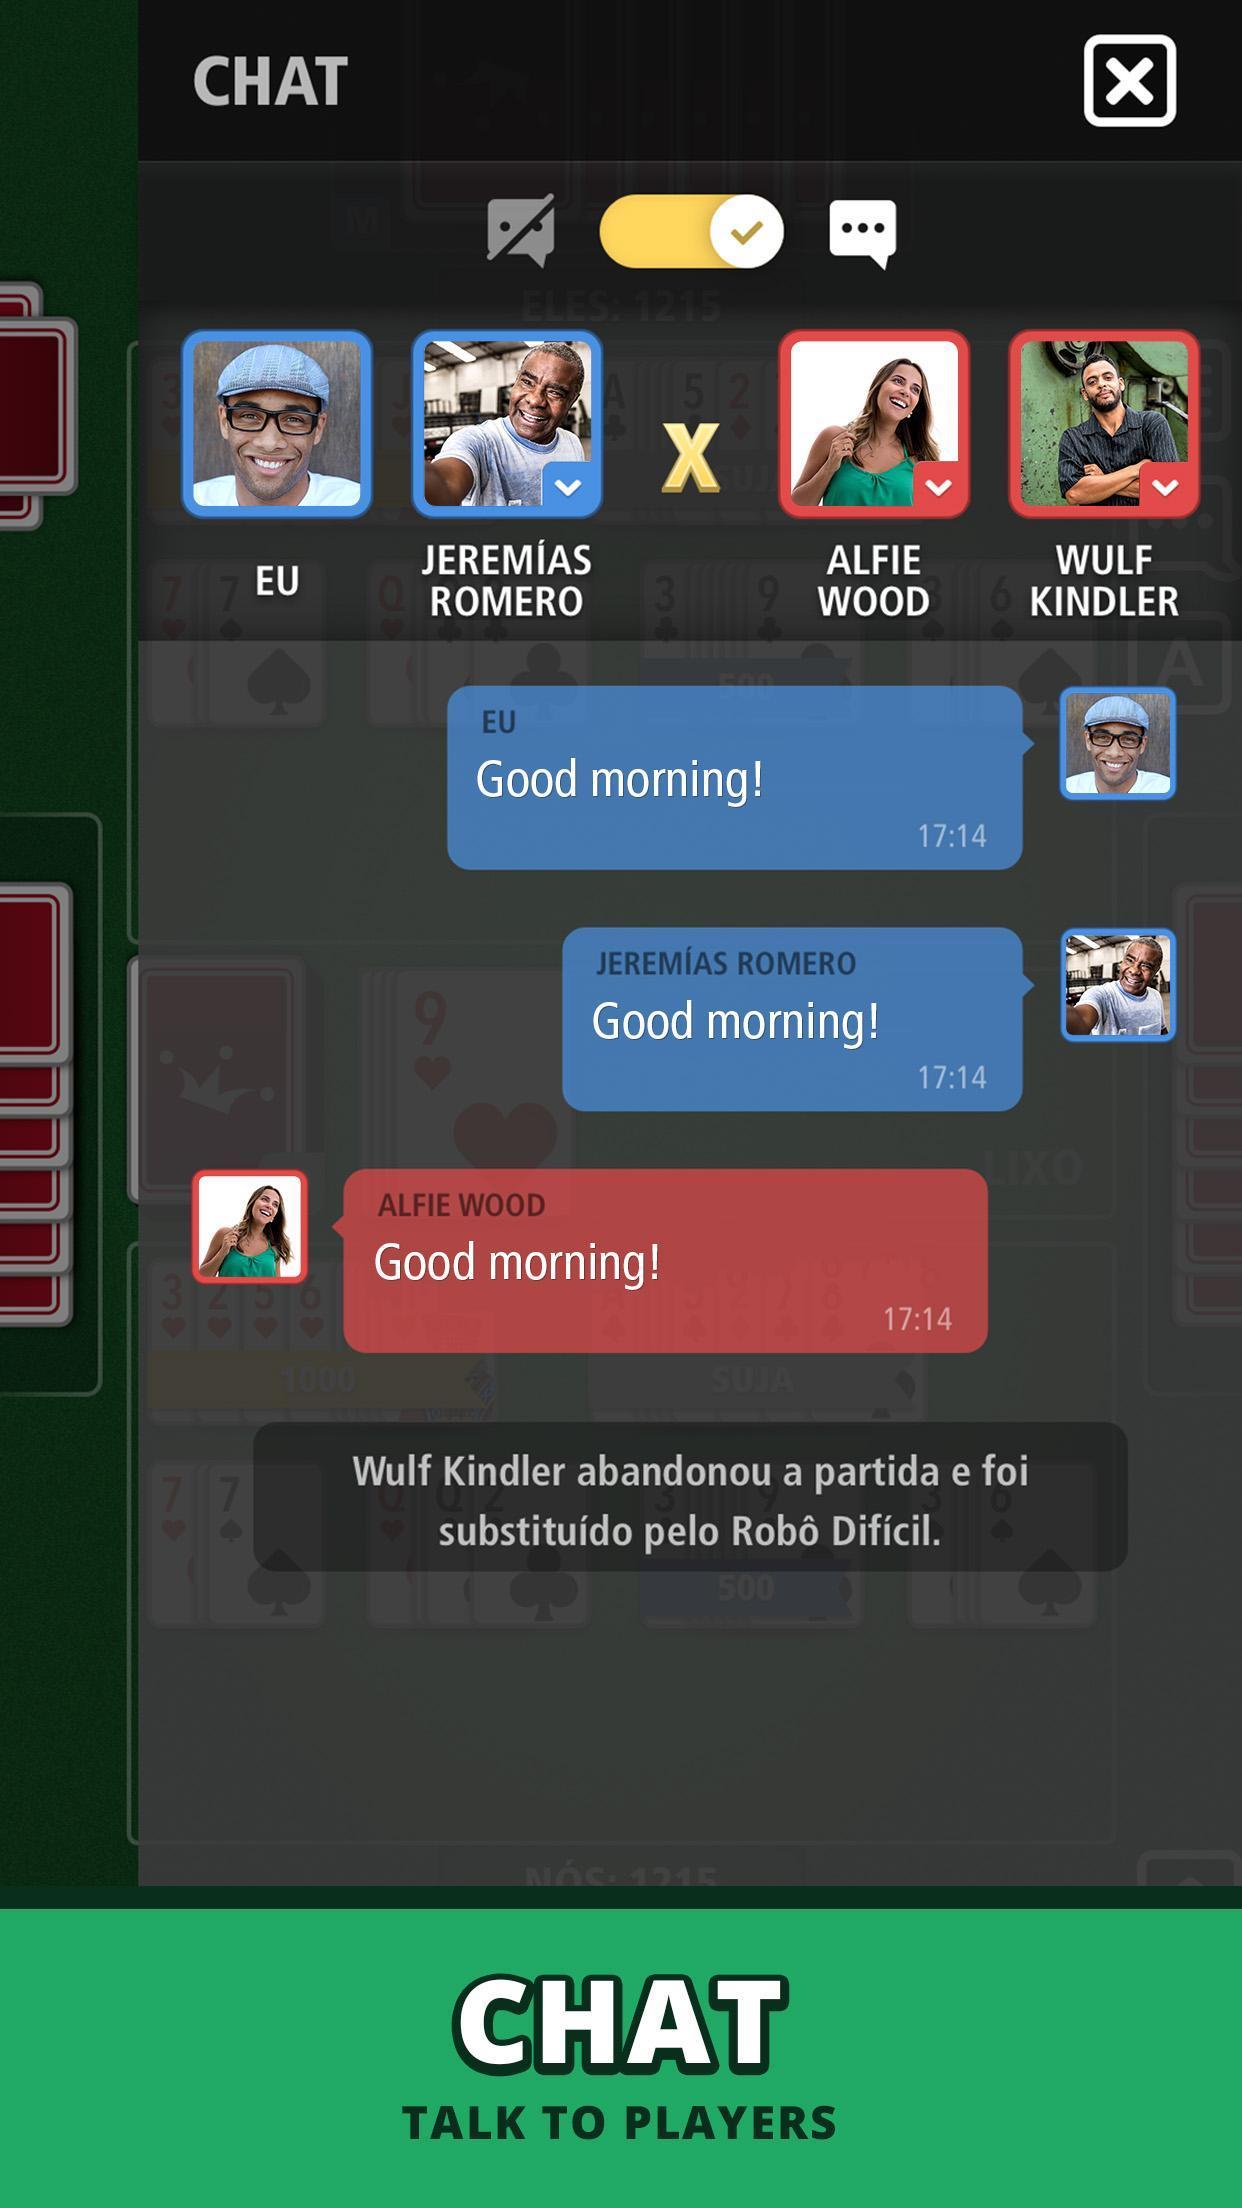 Buraco Canasta Jogatina: Card Games For Free 4.0.2 Screenshot 6